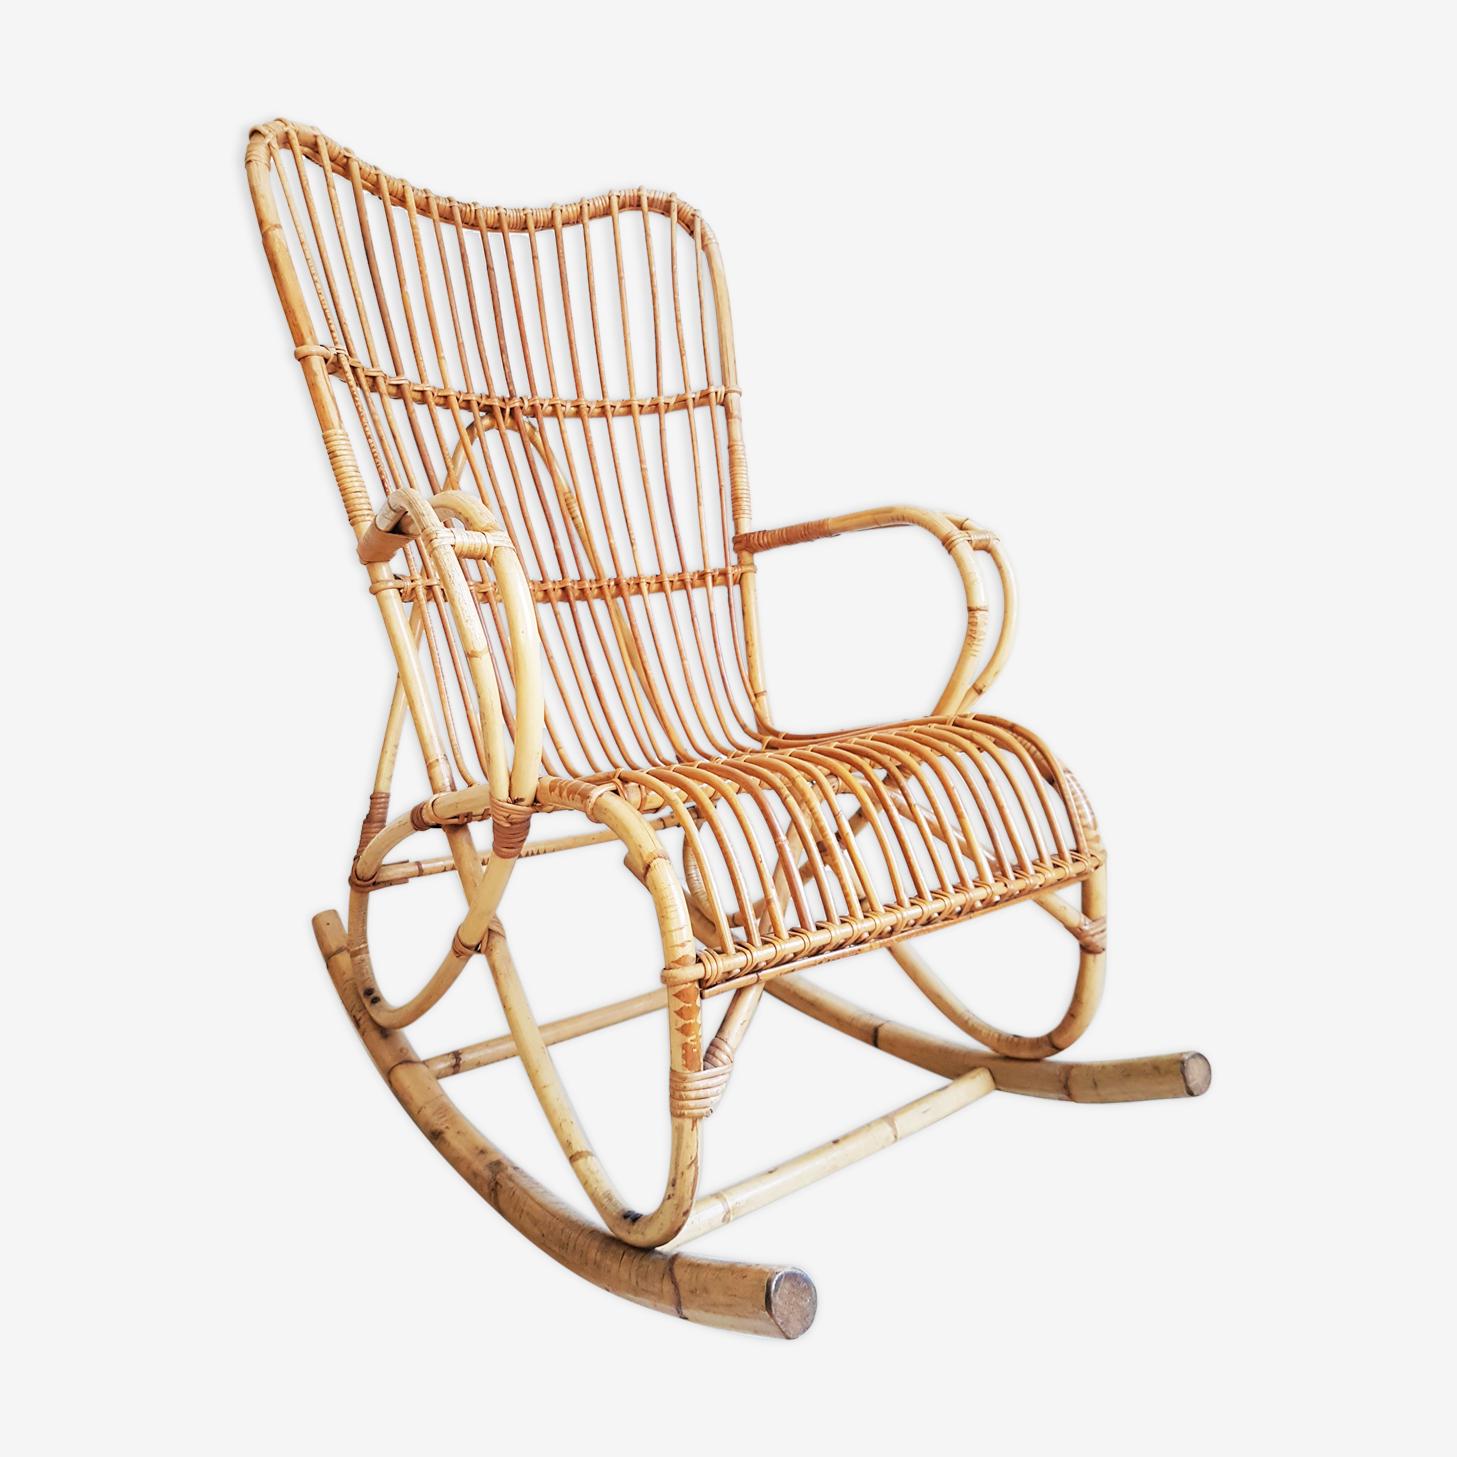 Rocking-chair en rotin vintage